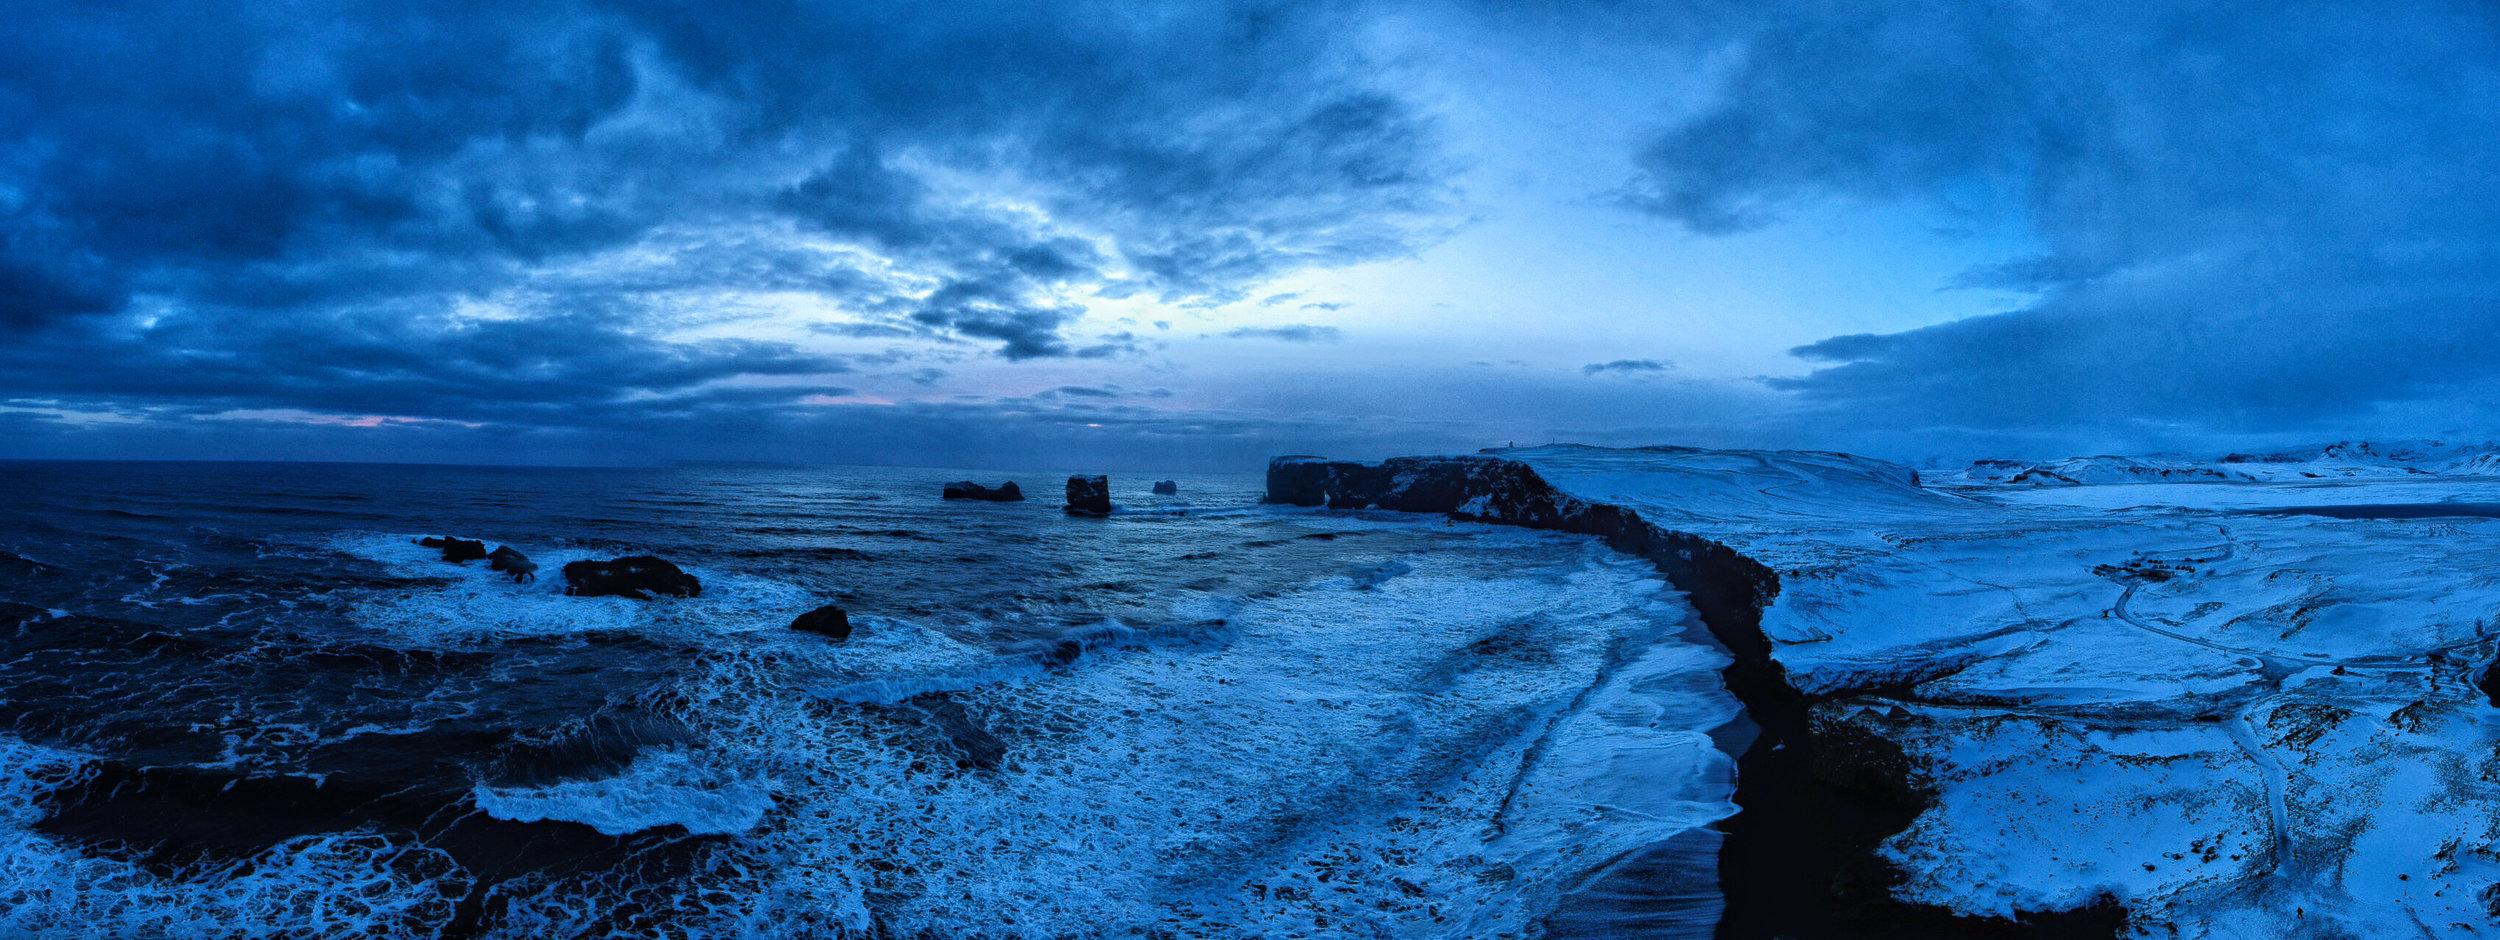 Iceland 2018 - Drone Pano--4.jpg